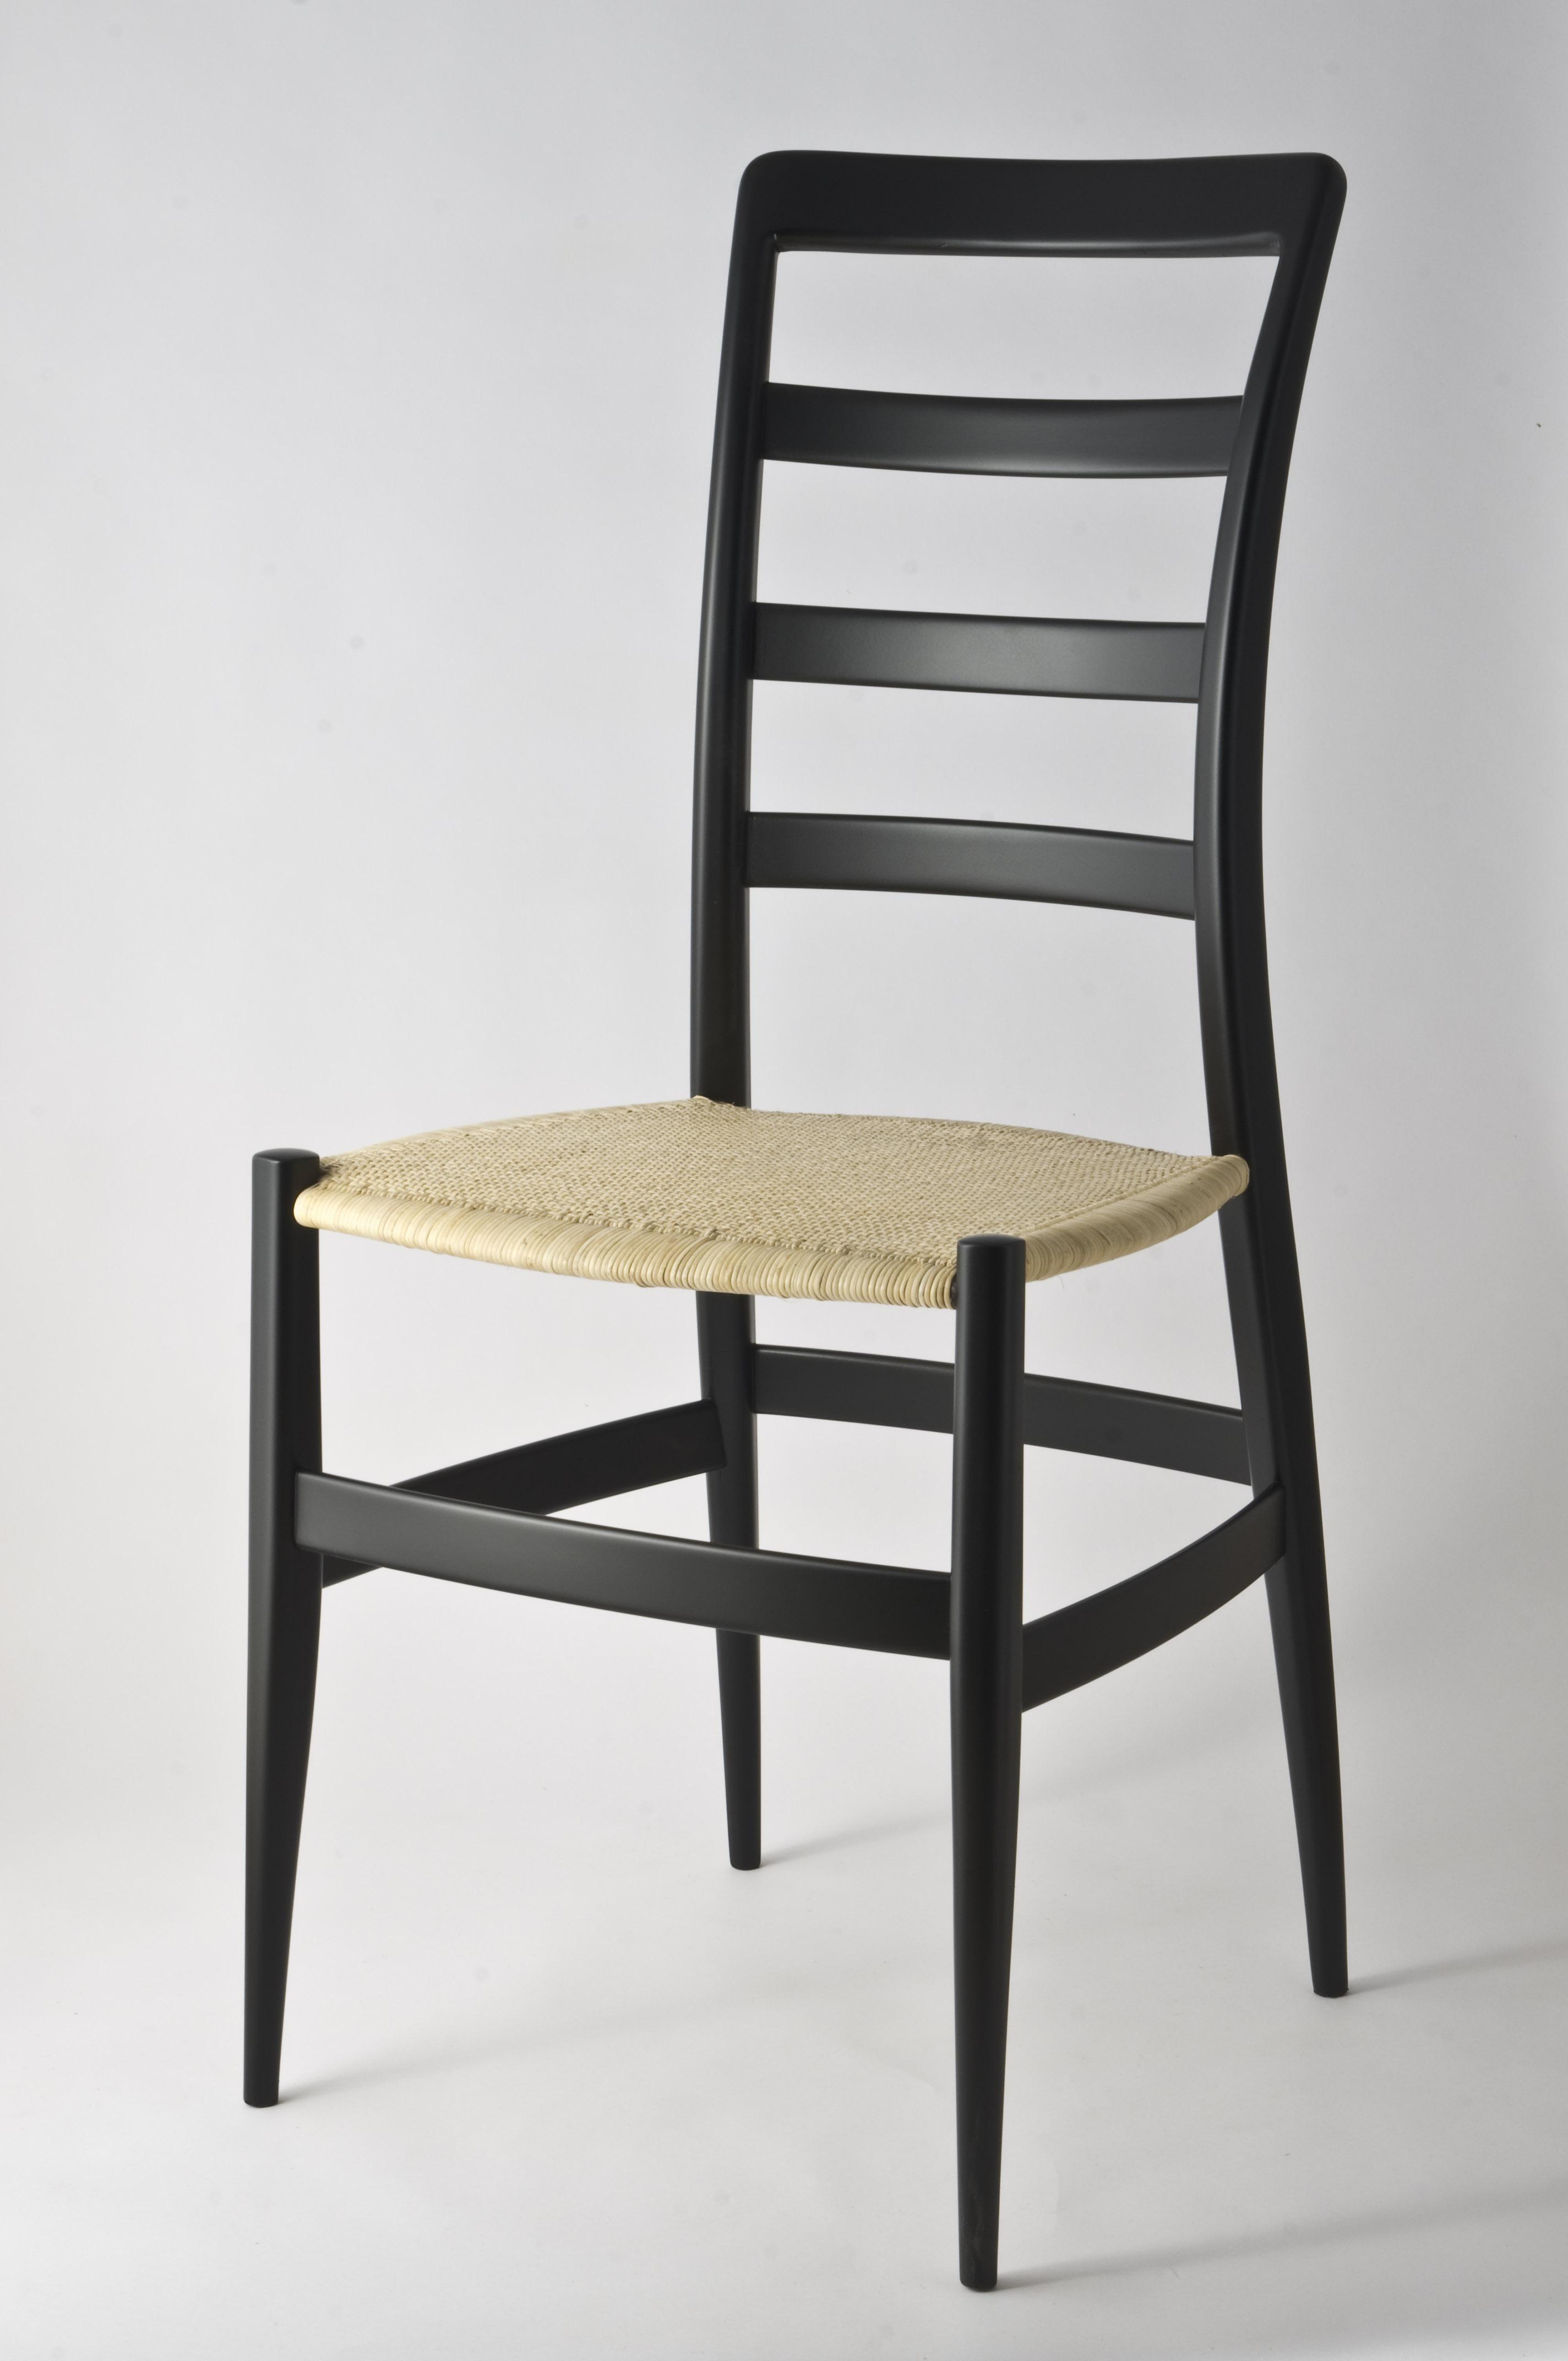 Leggero come una sedia levaggi sedie a chiavari for Sedie design usate